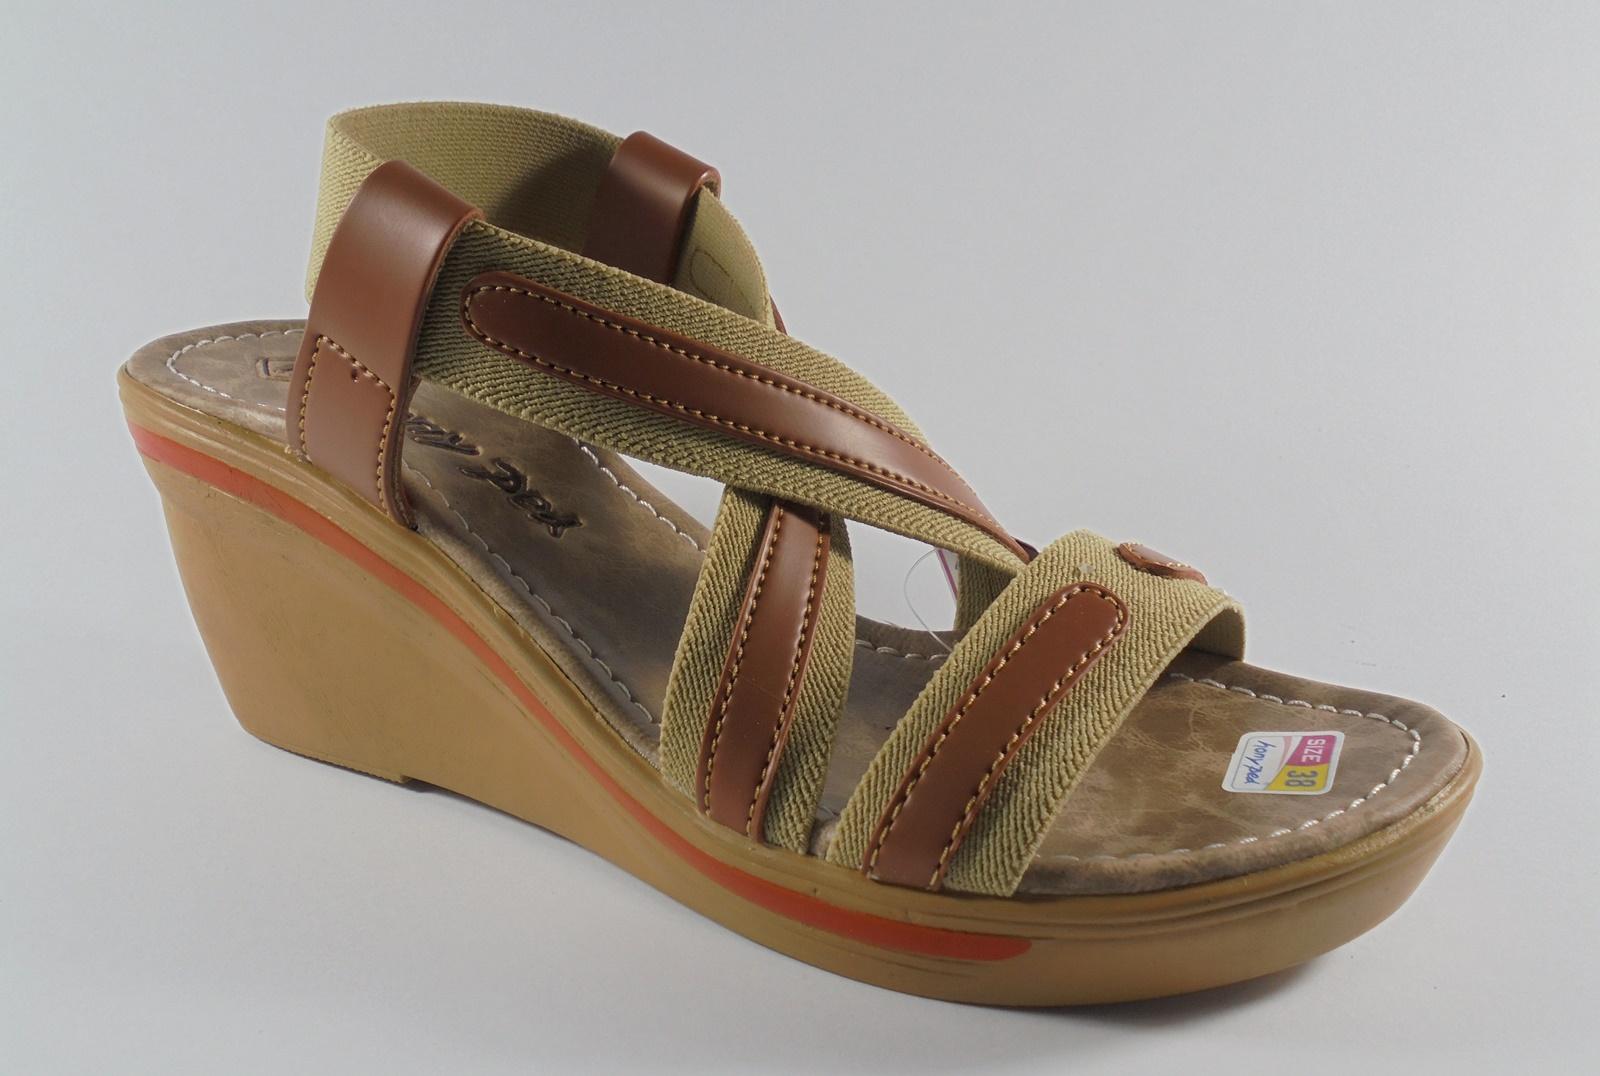 Grosir Sandal Wanita